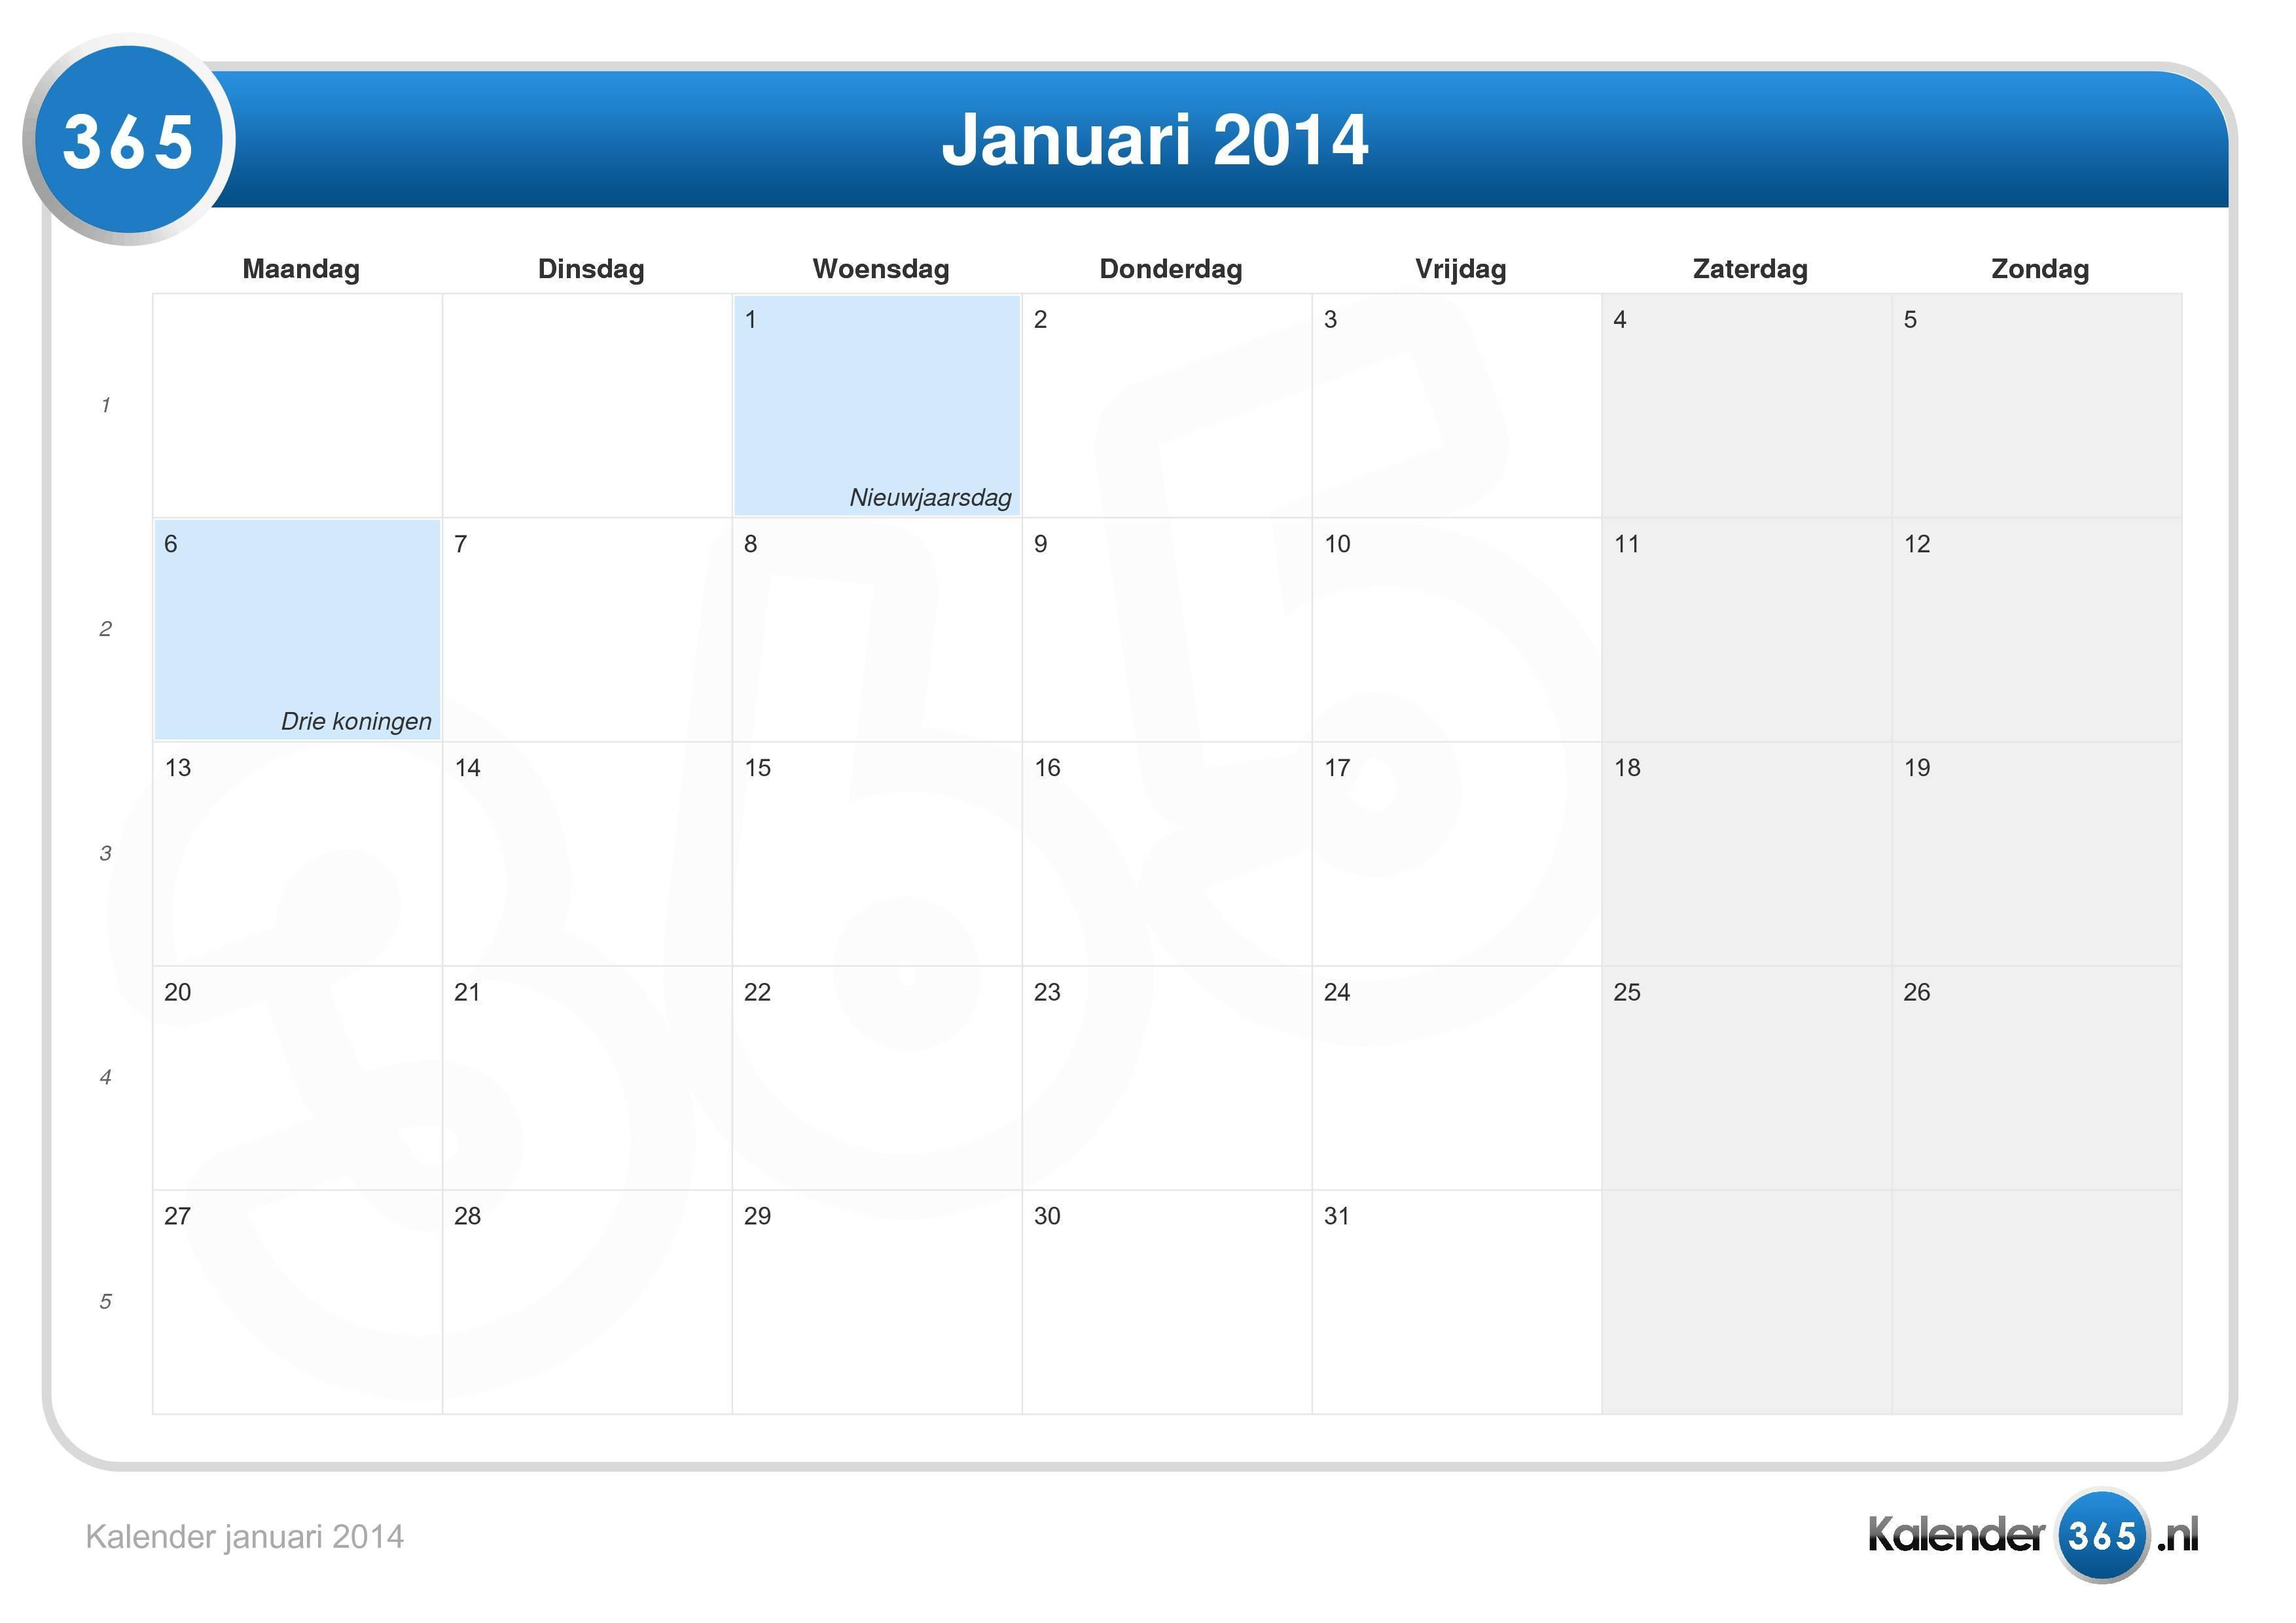 Kalender januari 2014